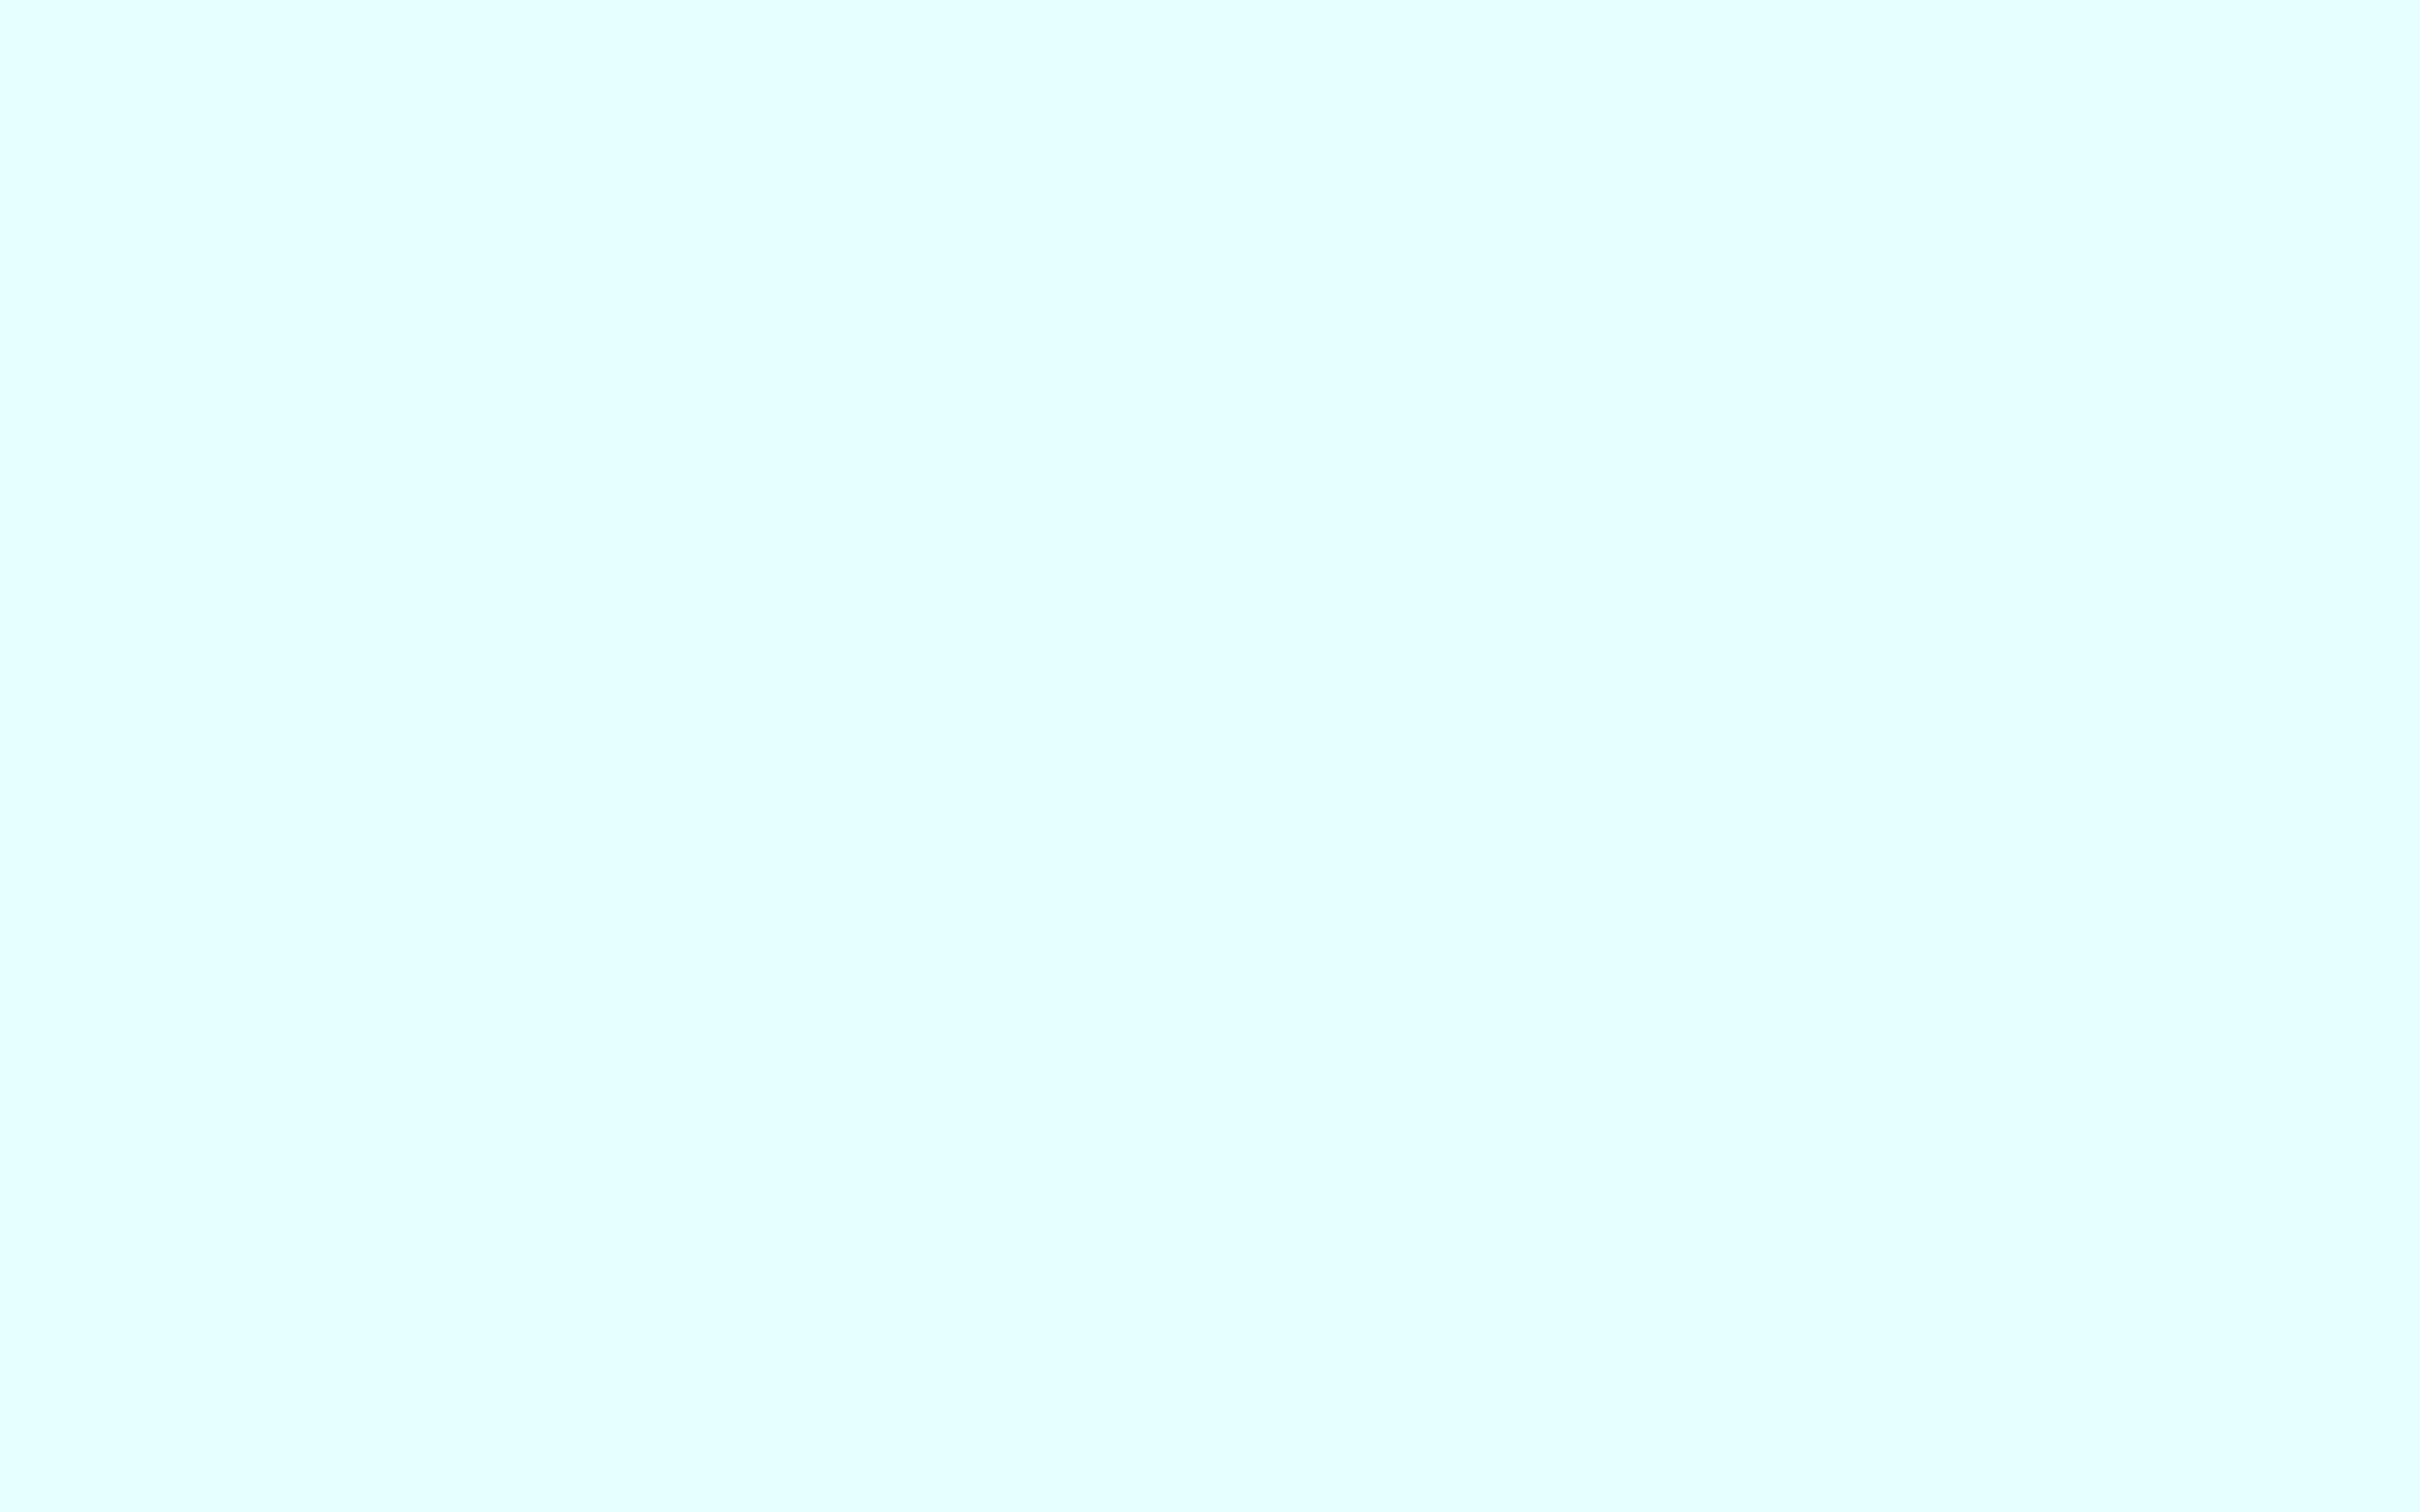 2560x1600 Bubbles Solid Color Background